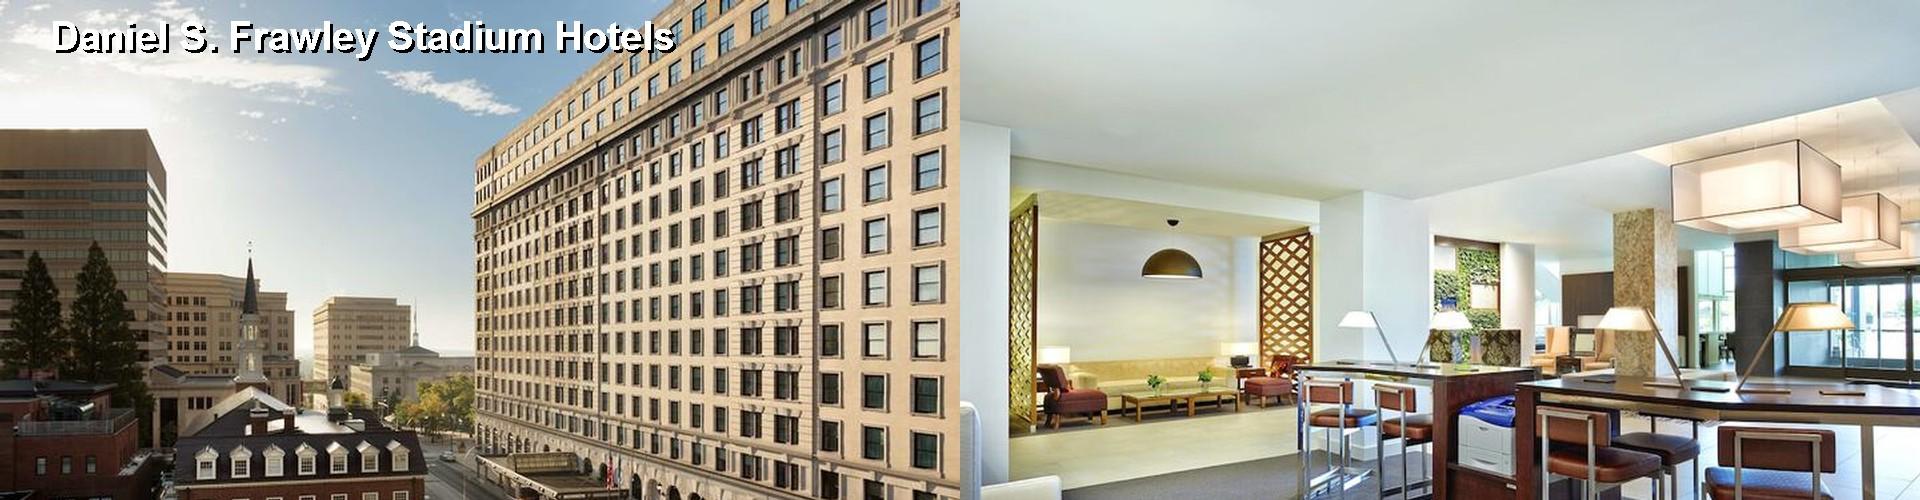 5 Best Hotels Near Daniel S Frawley Stadium